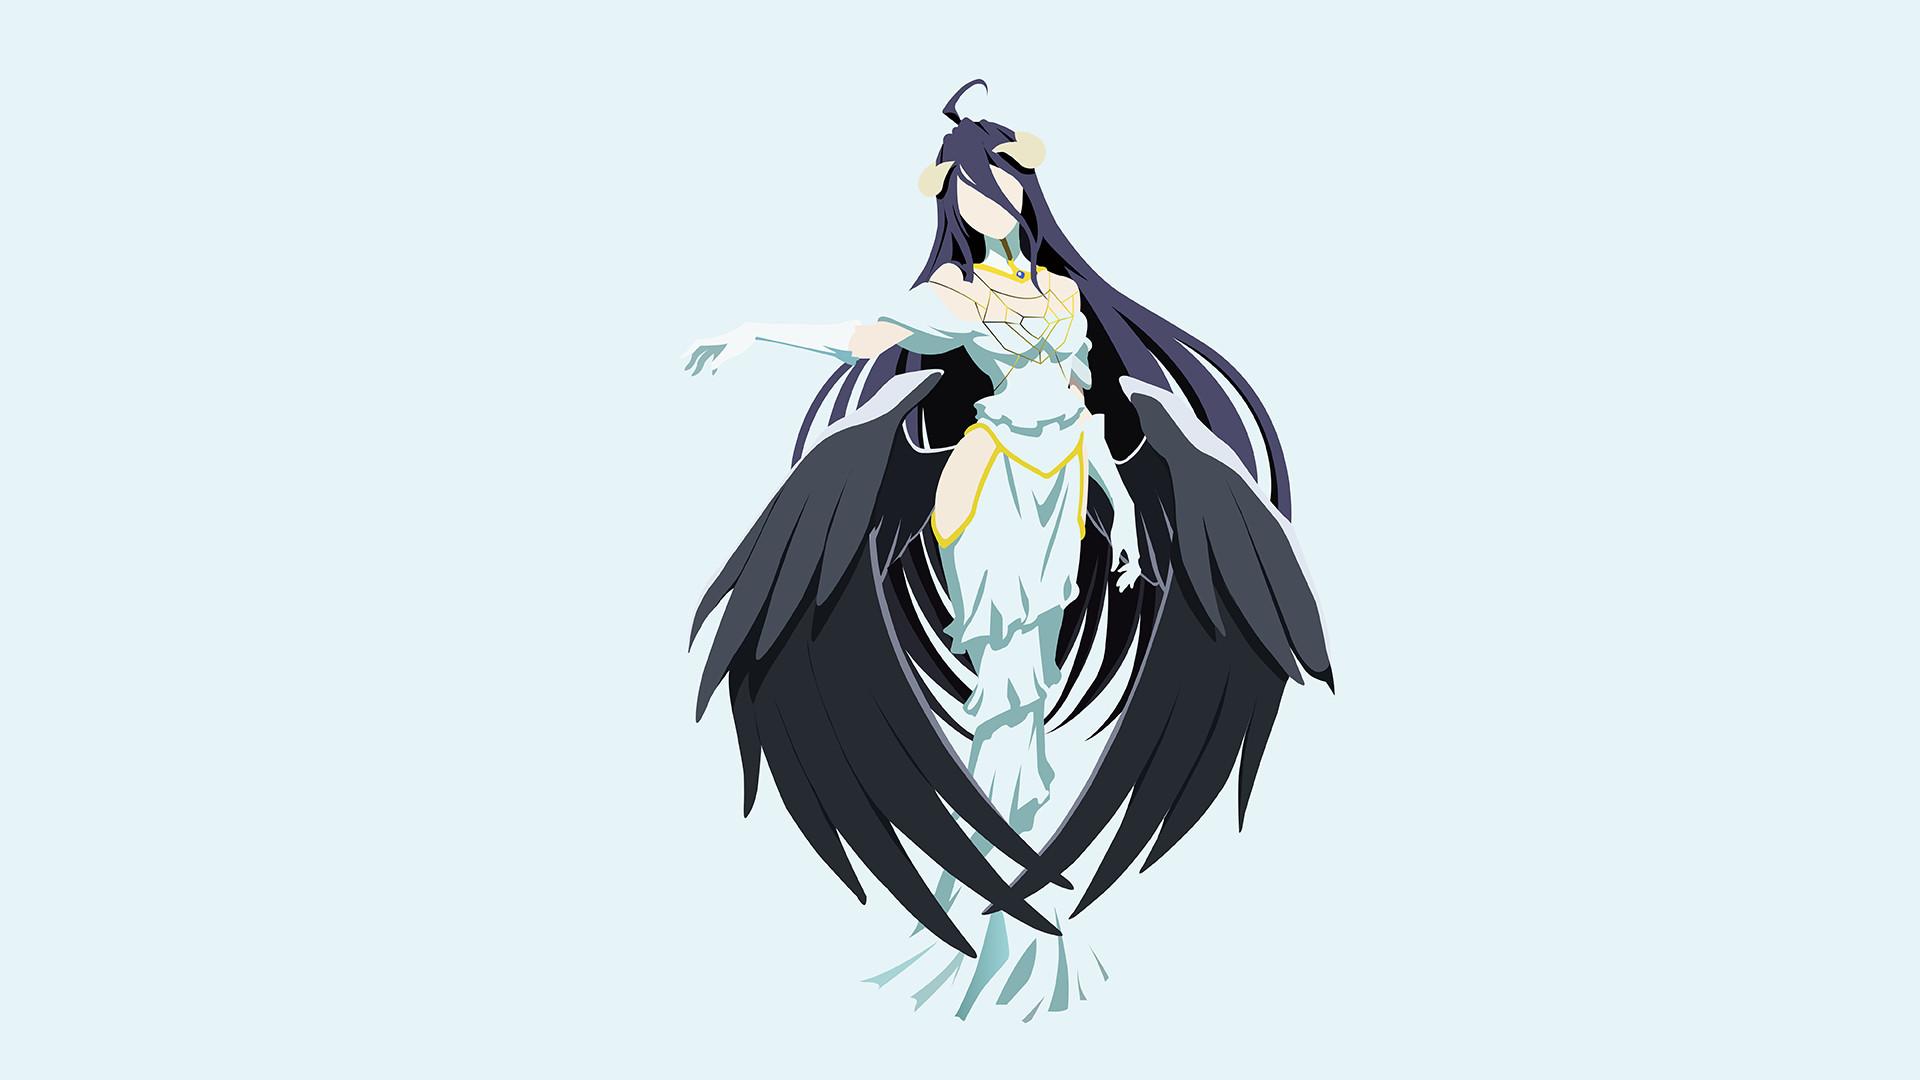 Anime – Overlord Albedo (Overlord) Overlord (Anime) Bakgrund